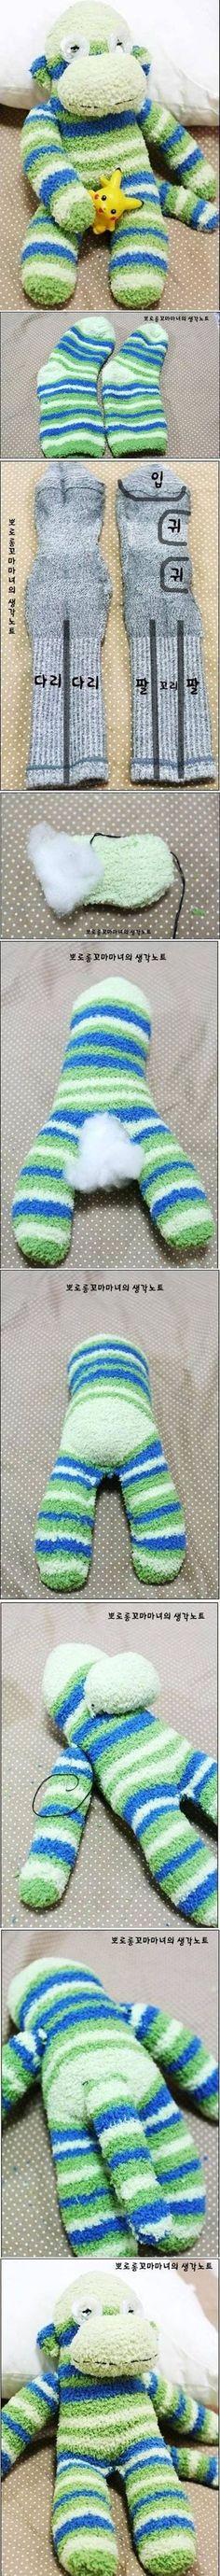 DIY Sock Monkey Terry DIY Projects / UsefulDIY.com